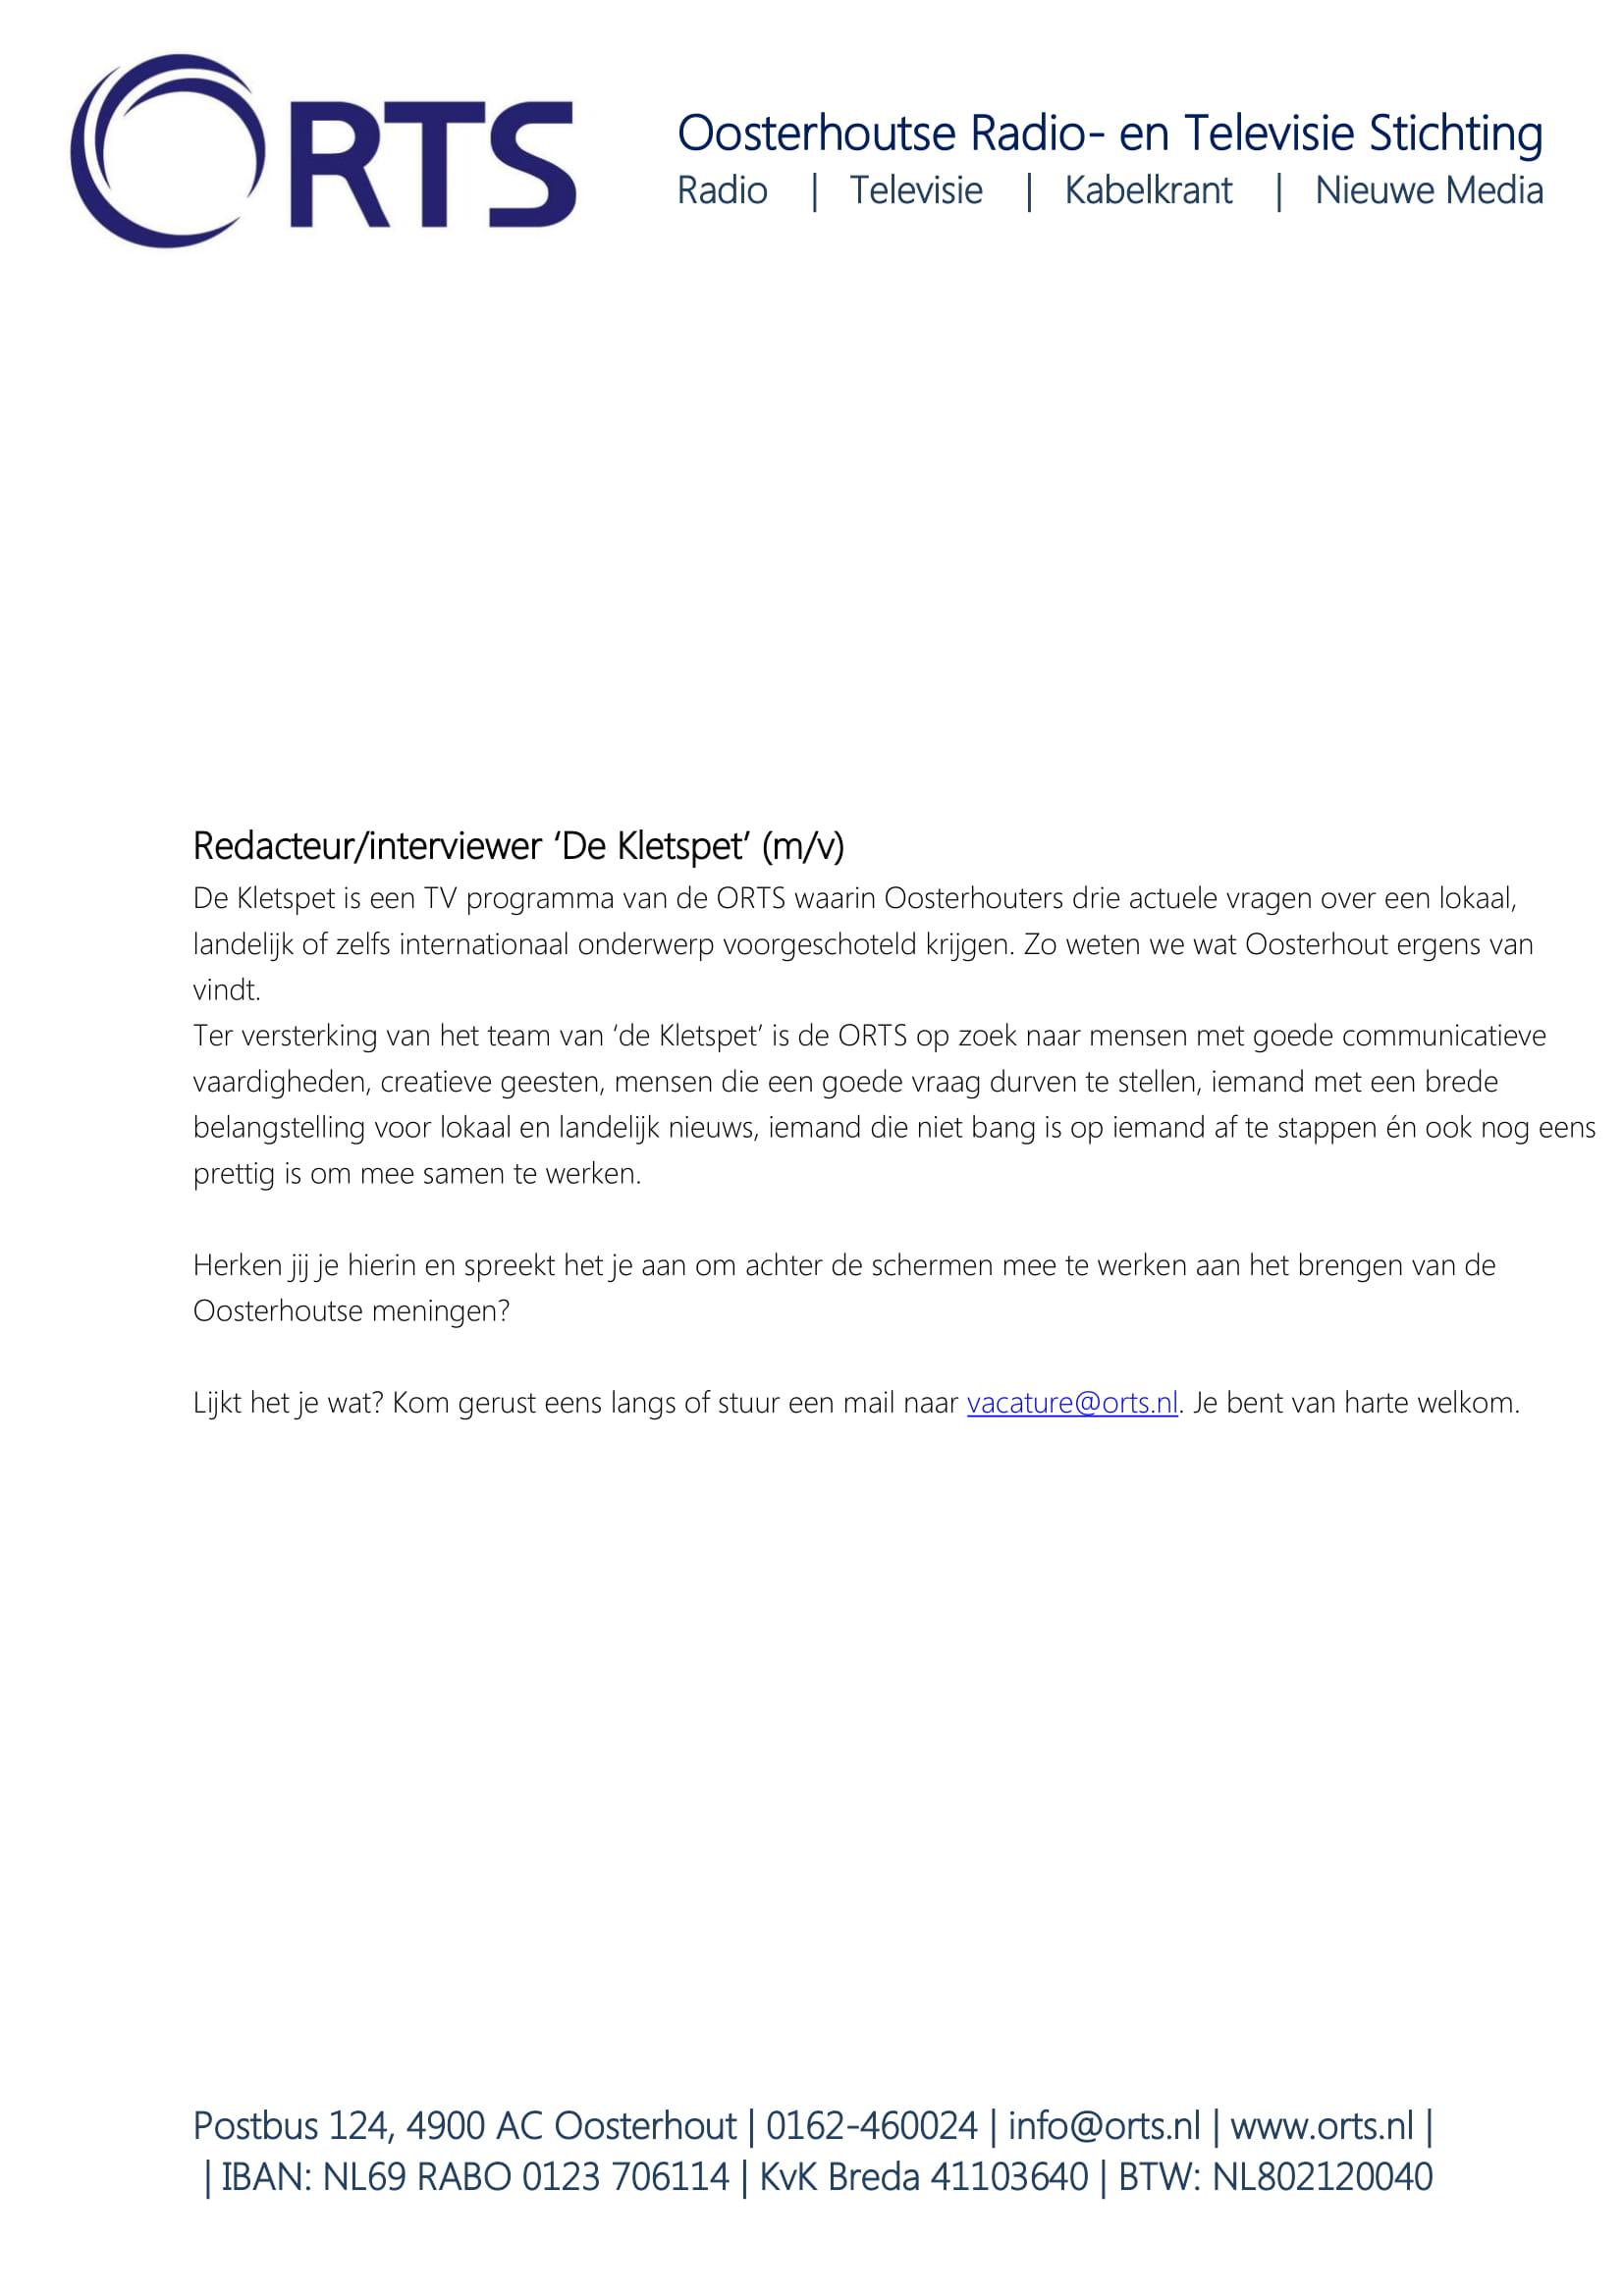 redacteur Inteviewer De Kletspet-1